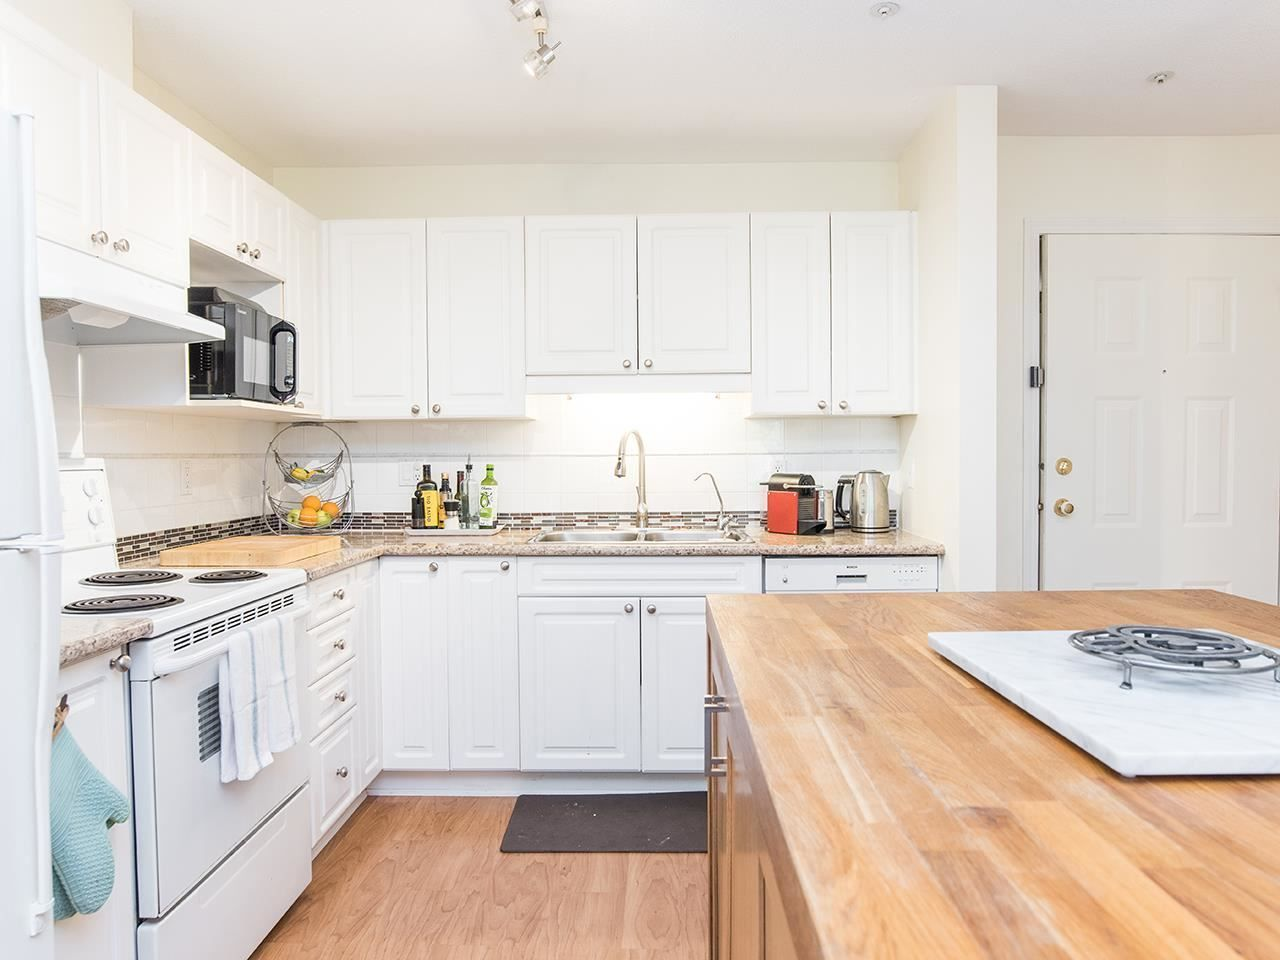 9688-148-street-guildford-north-surrey-09 at 306 - 9688 148 Street, Guildford, North Surrey